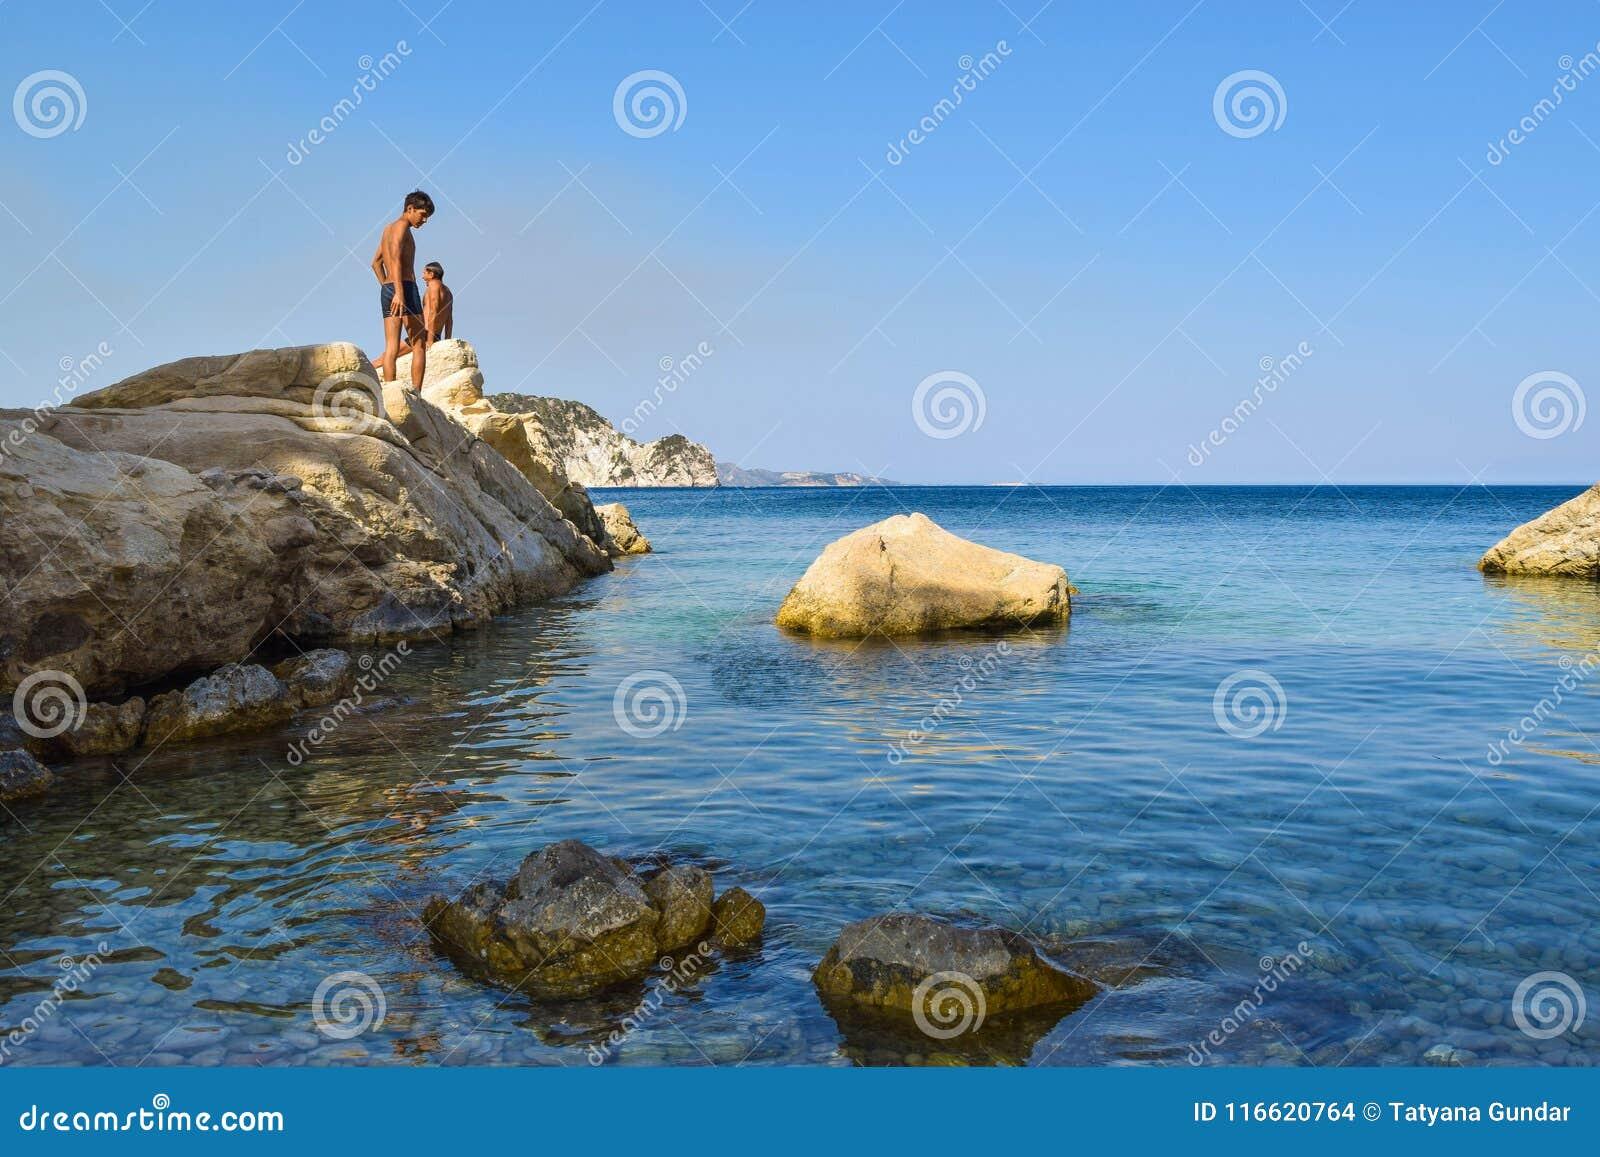 Leute auf dem Felsen